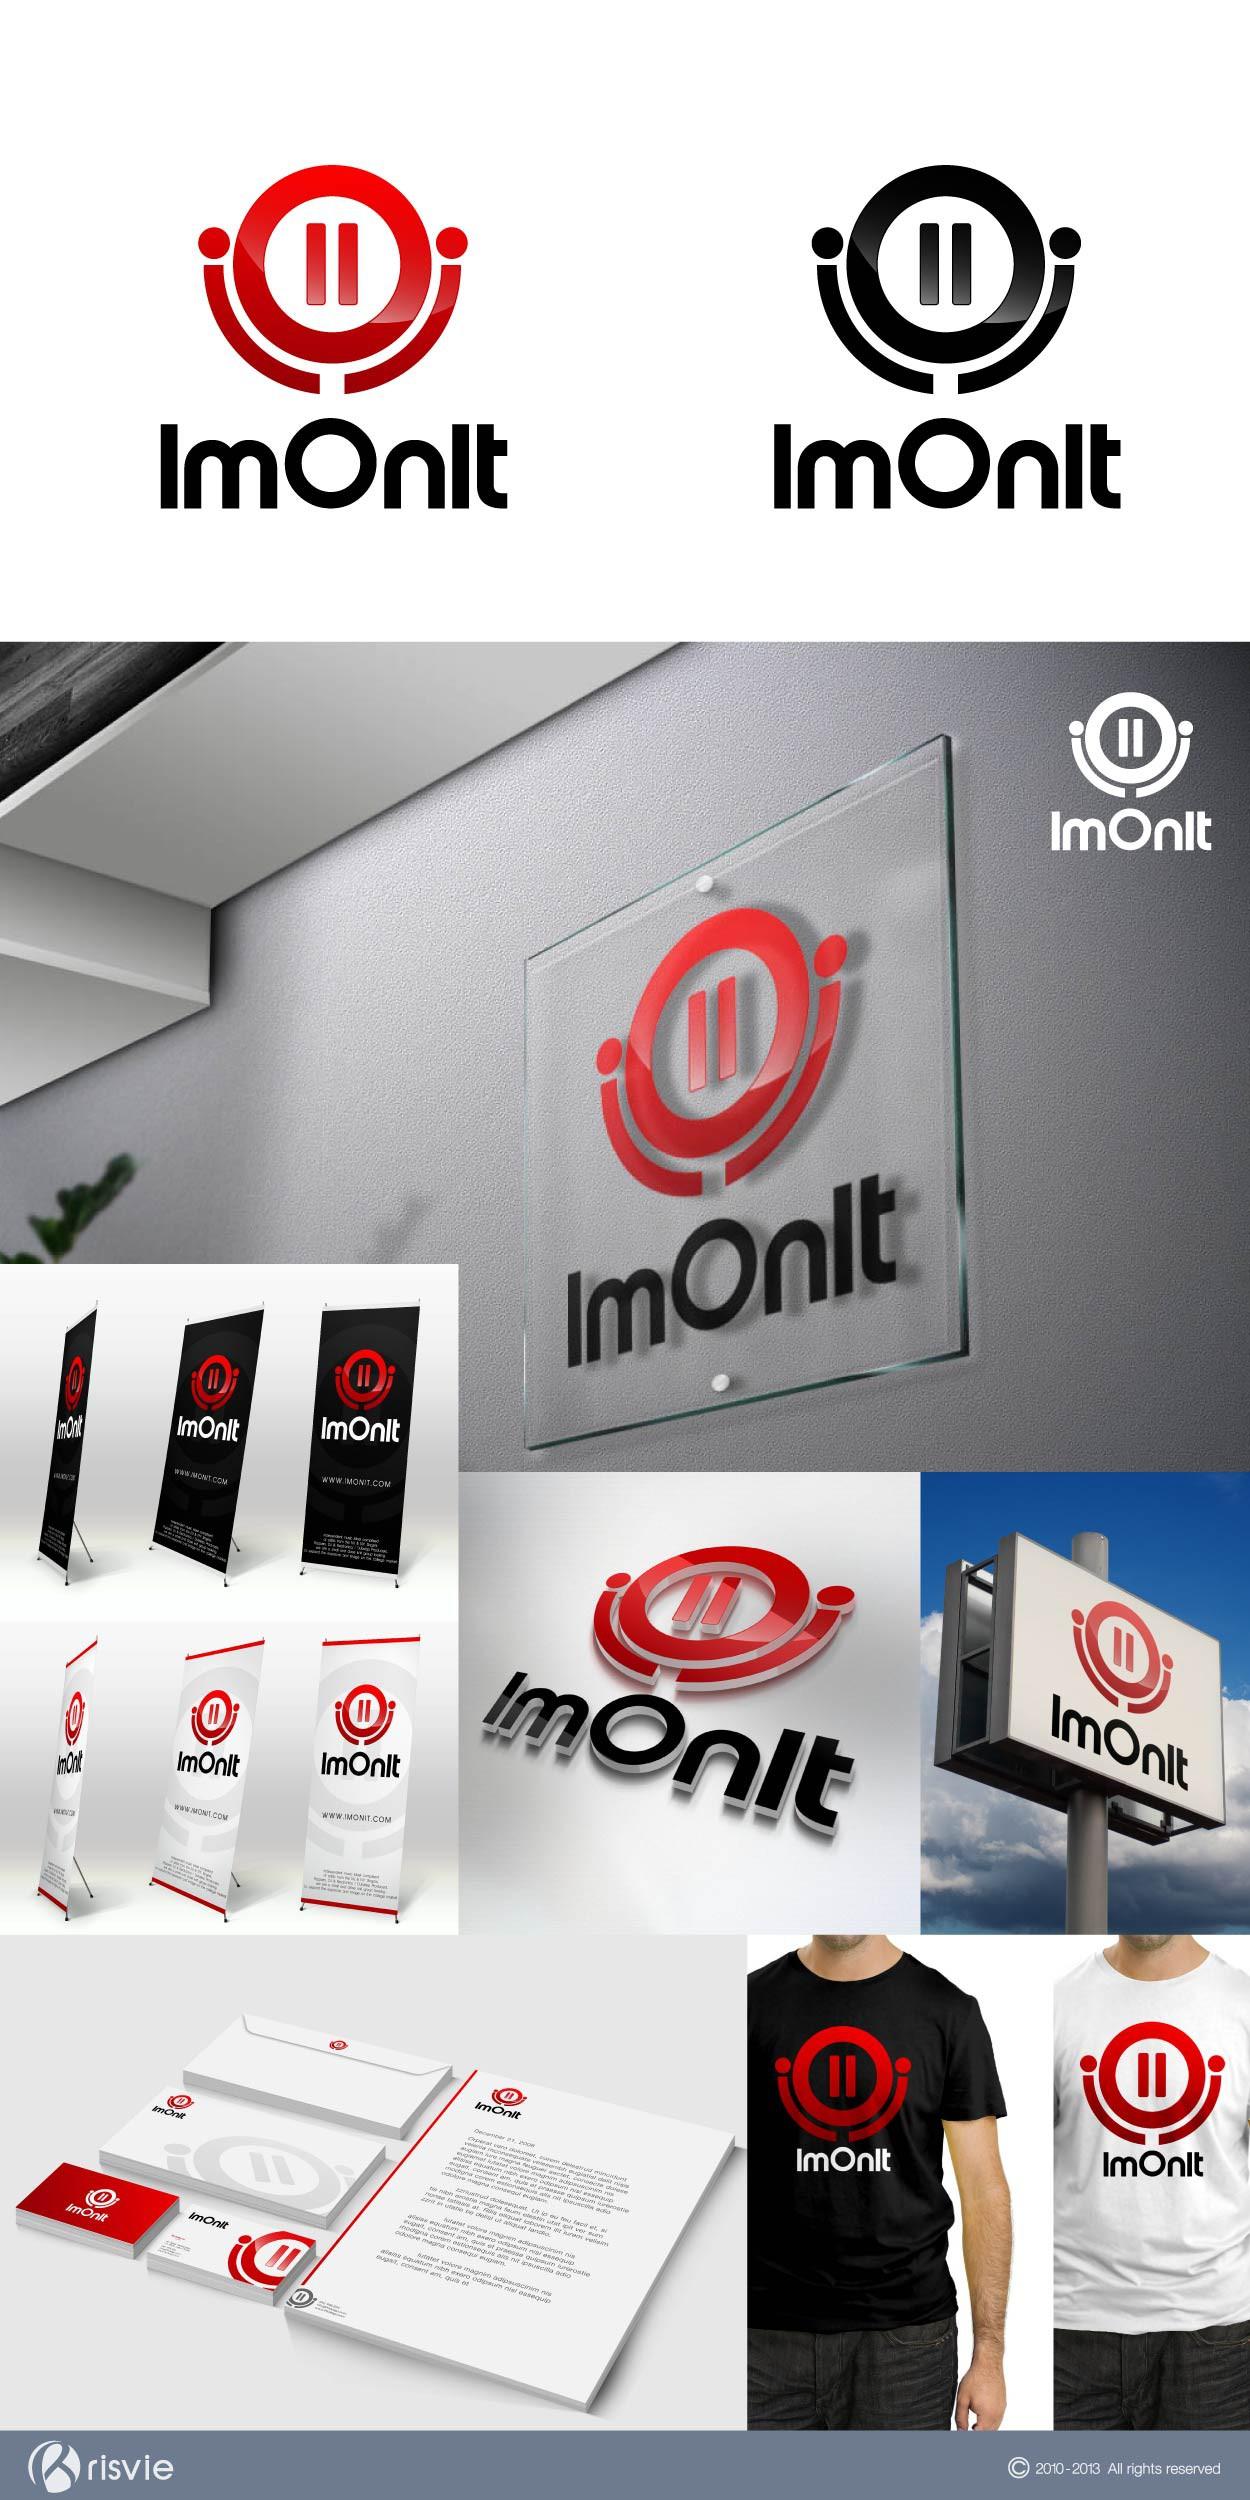 Independent Music Label iOi (I'mOnIt) needs a Fresh Logo